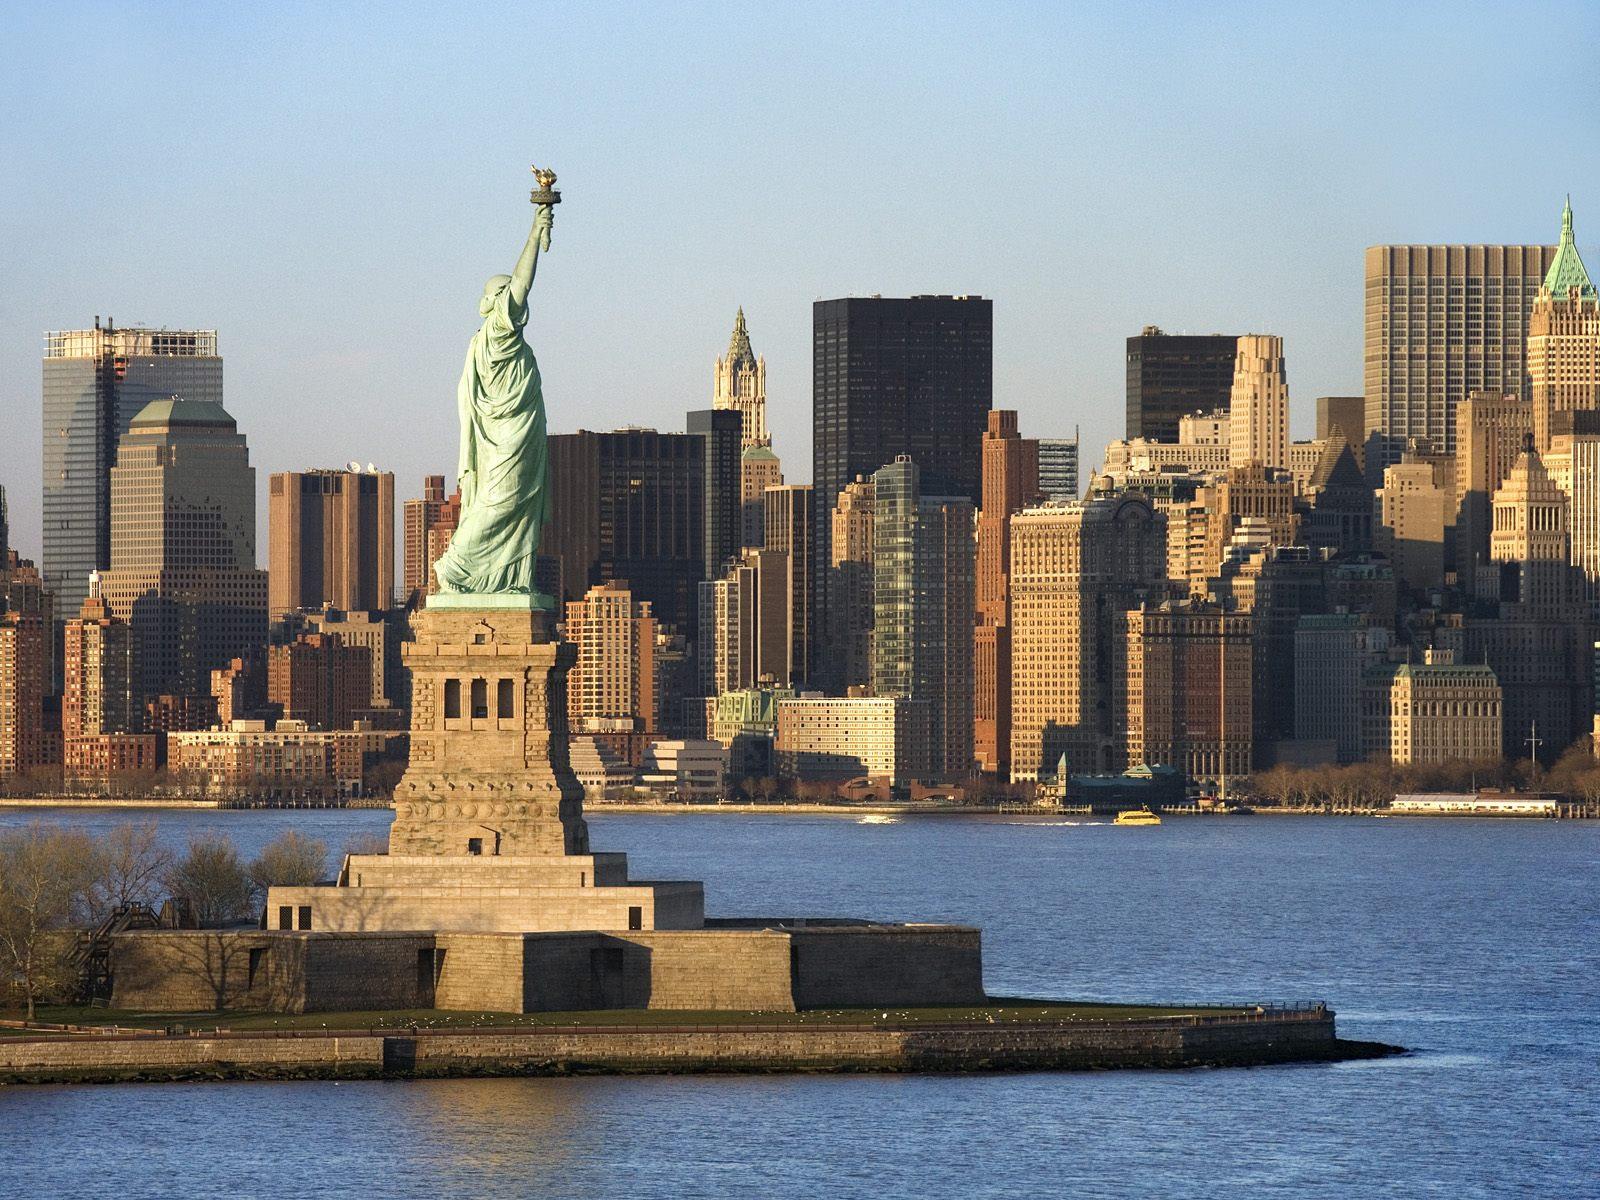 Statue+of+Liberty+in+New+York.jpg